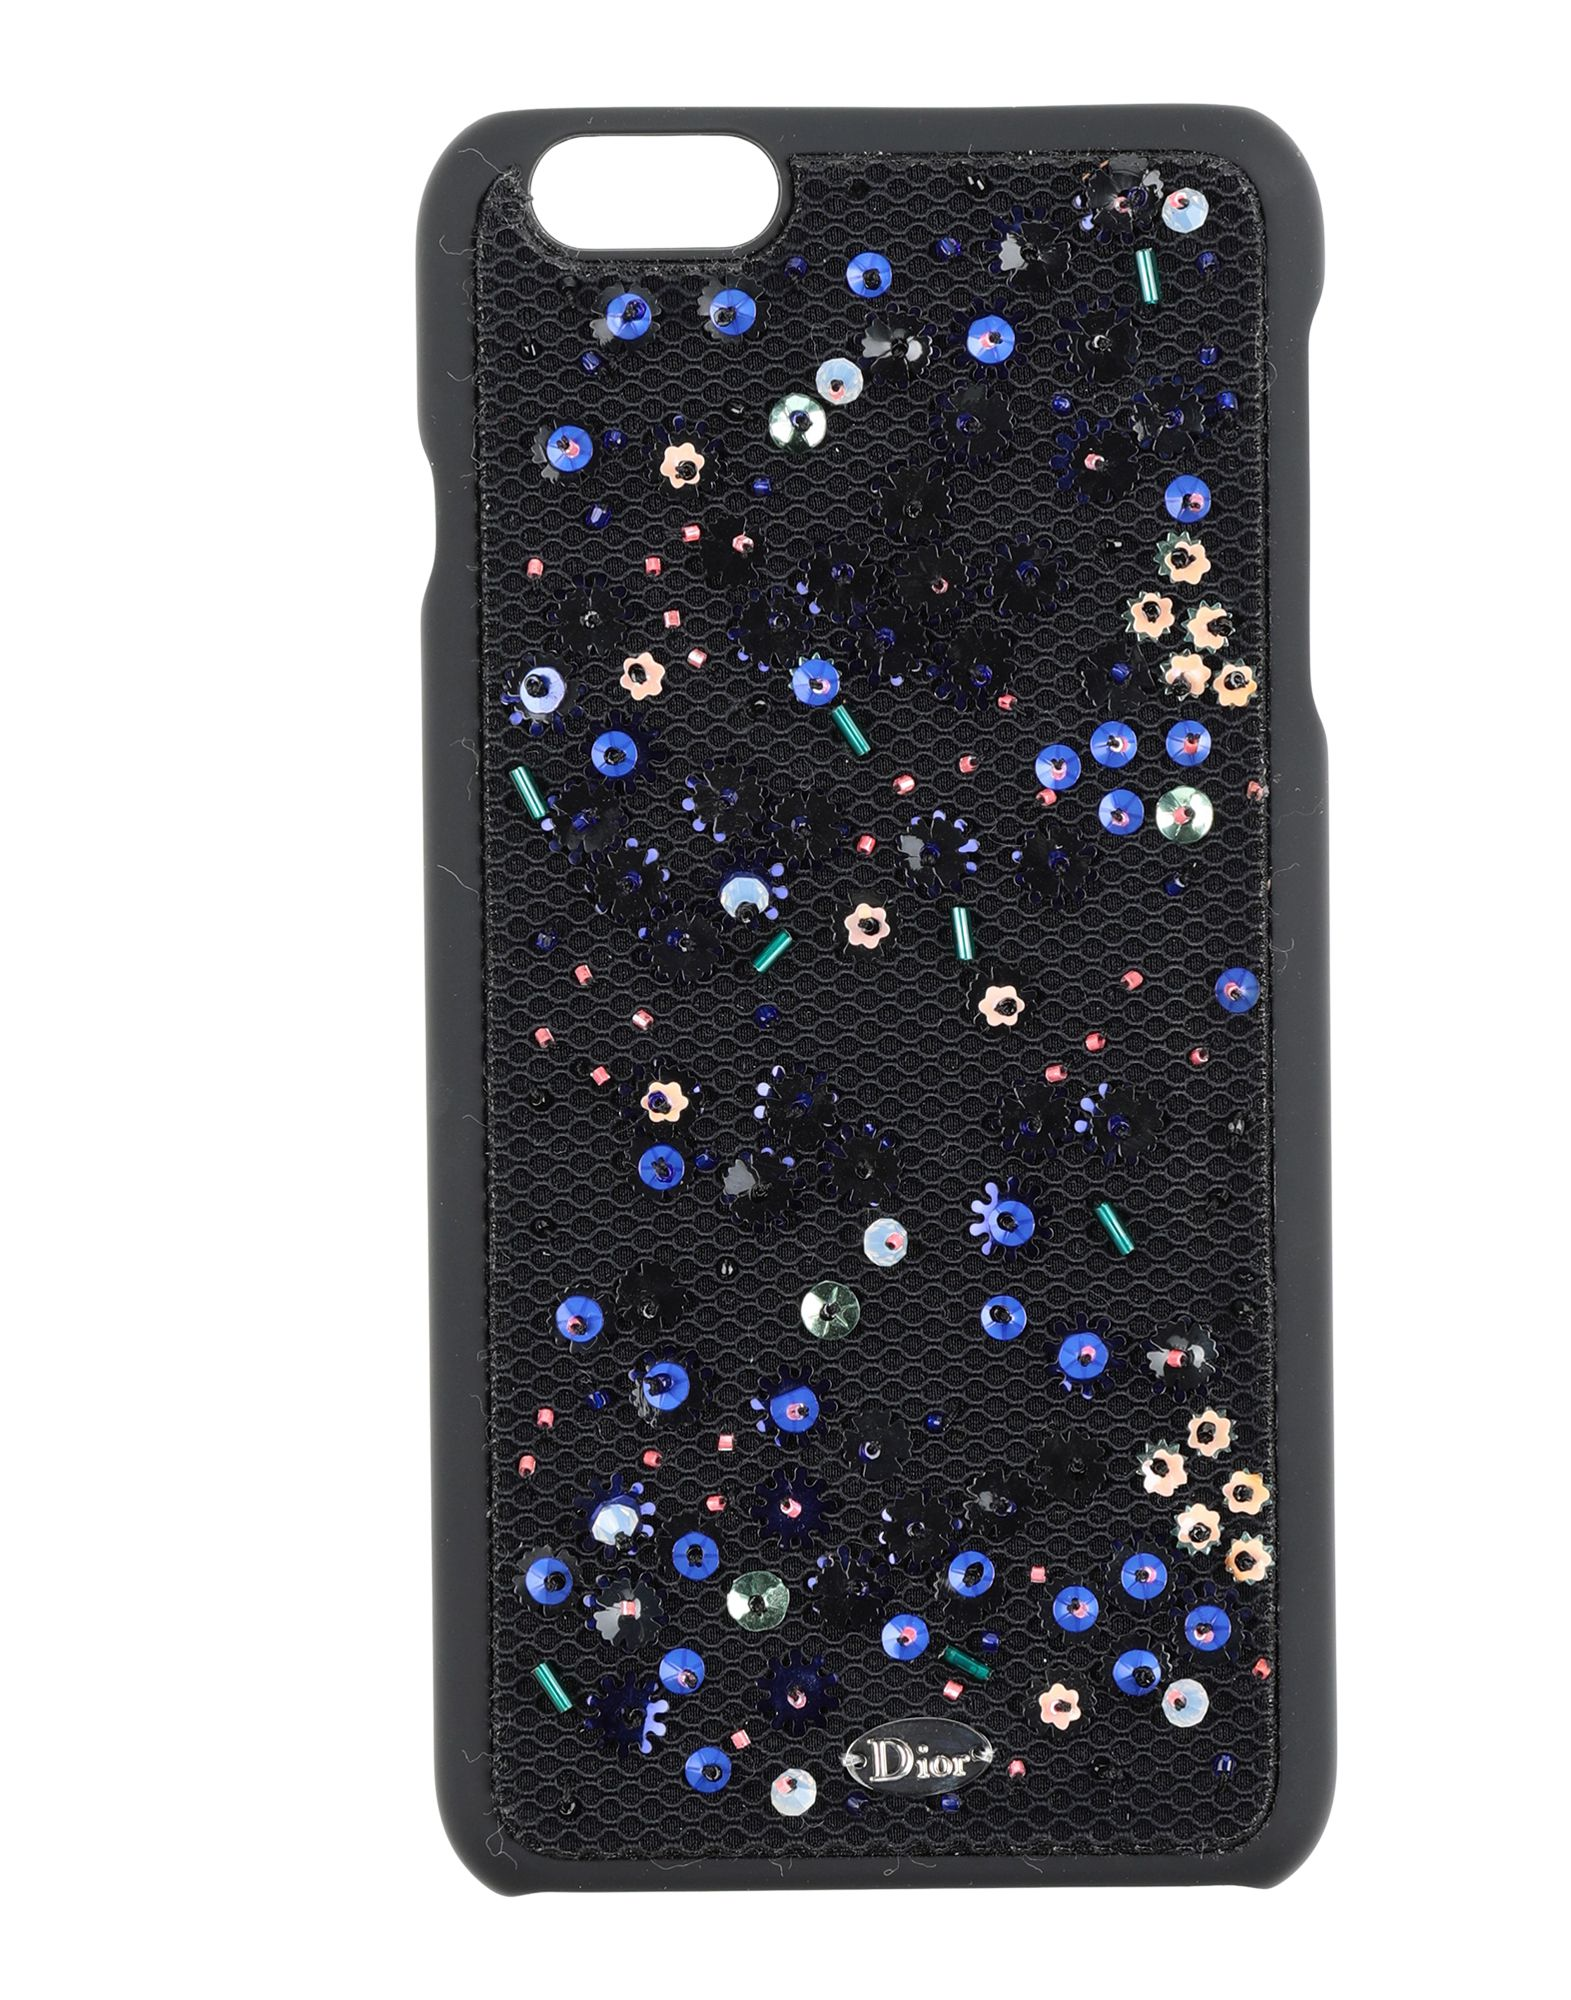 Фото - DIOR Чехол mooncase stripe design leather side flip wallet card slot pouch stand back чехол для apple iphone 6 plus blue